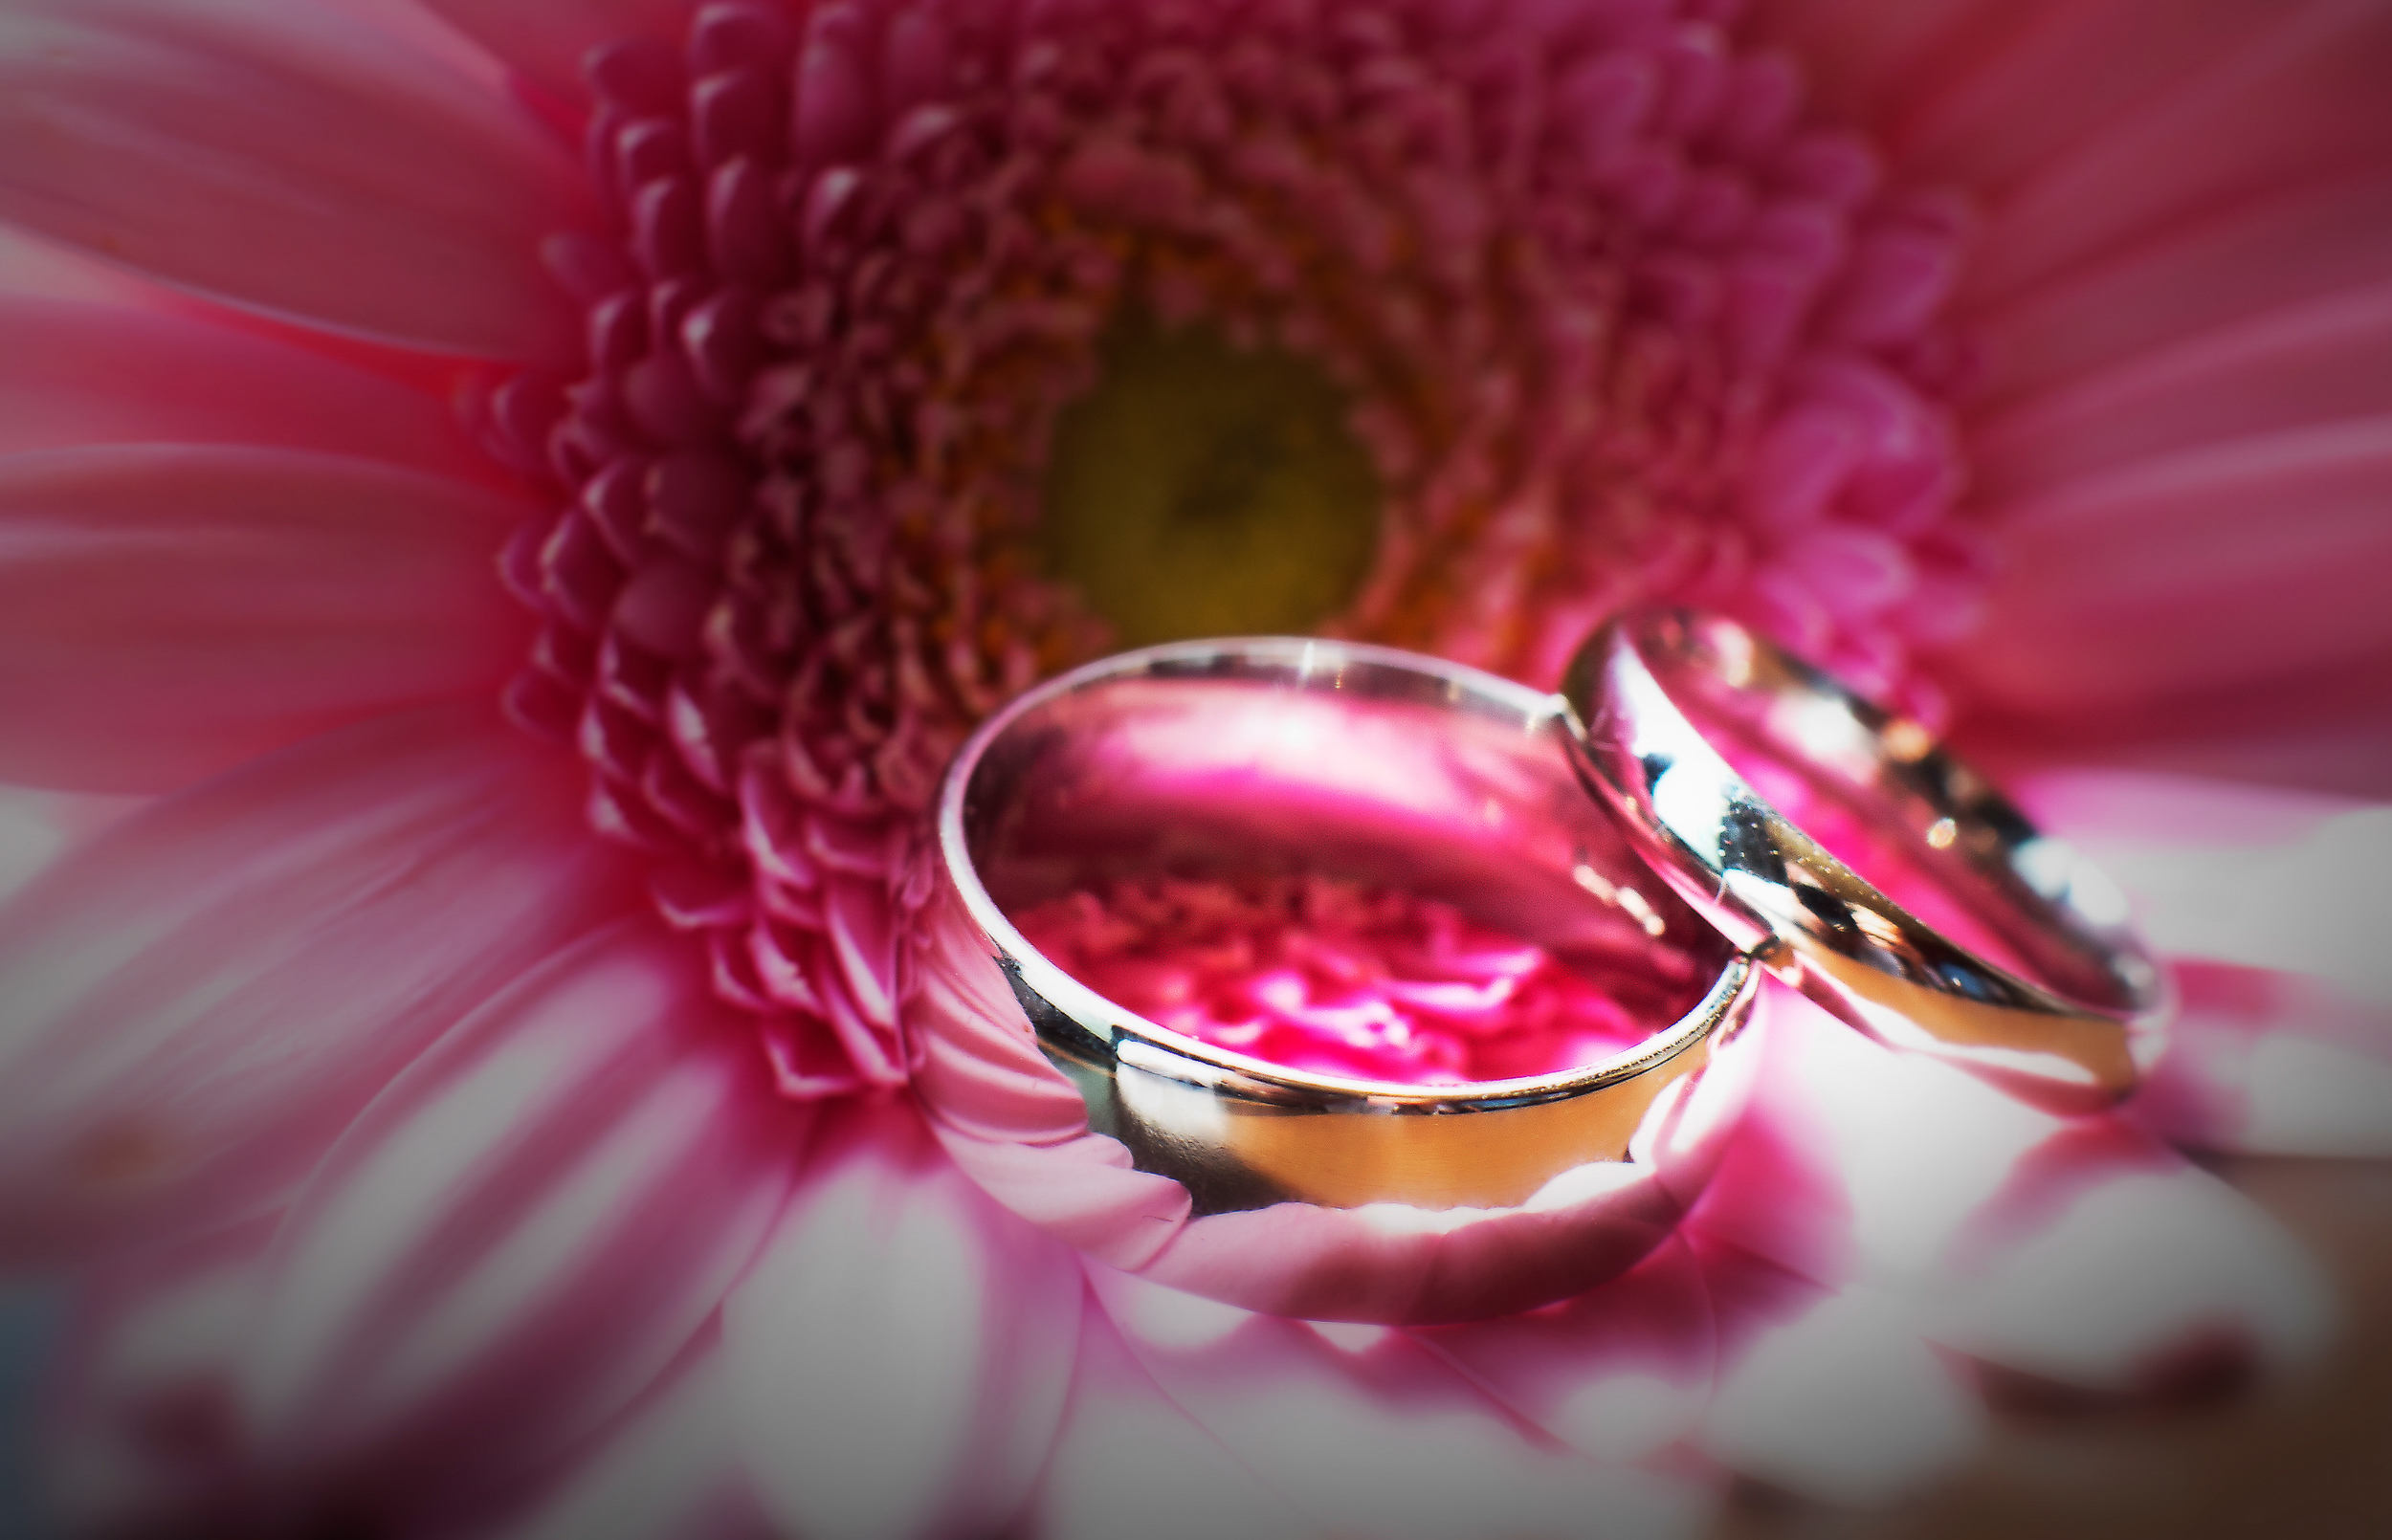 wedding-ring-shot-macro-pink-london-uk-destination-wedding-photography-Adam-Rowley